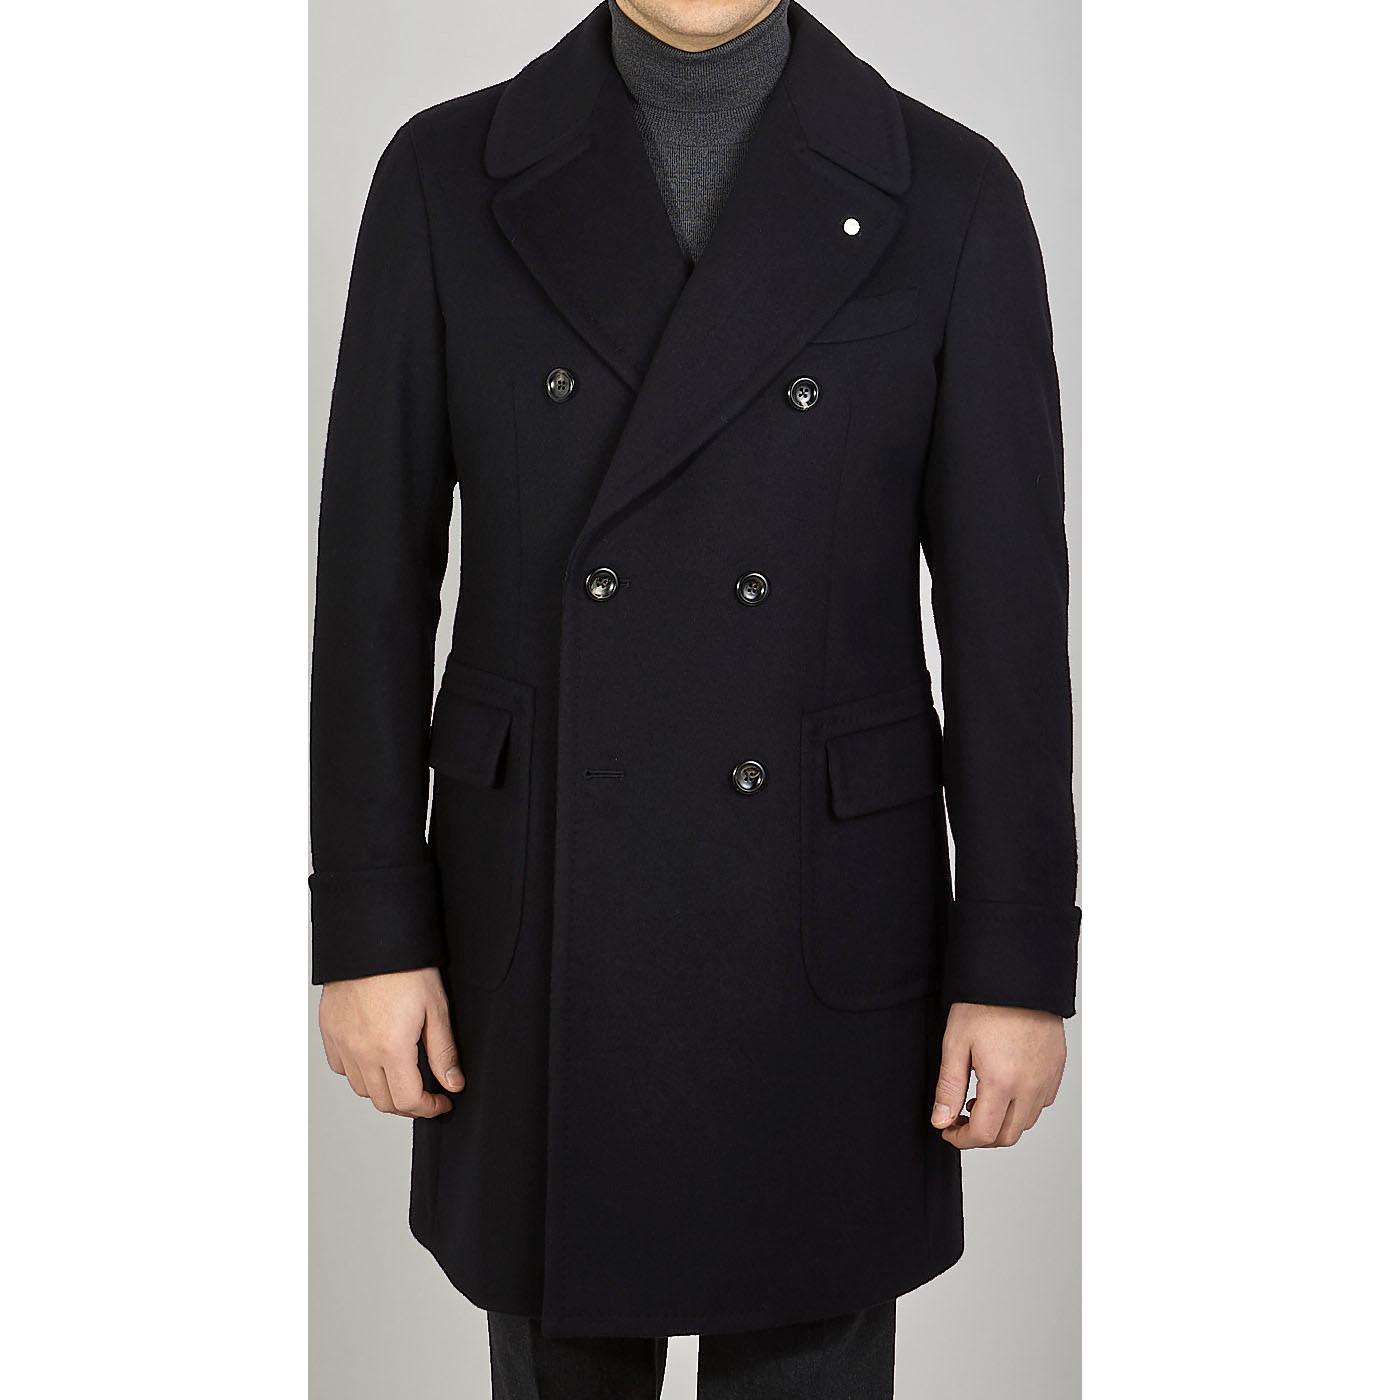 Luigi Bianchi Mantova Navy Wool Cashmere DB Polo Coat Front